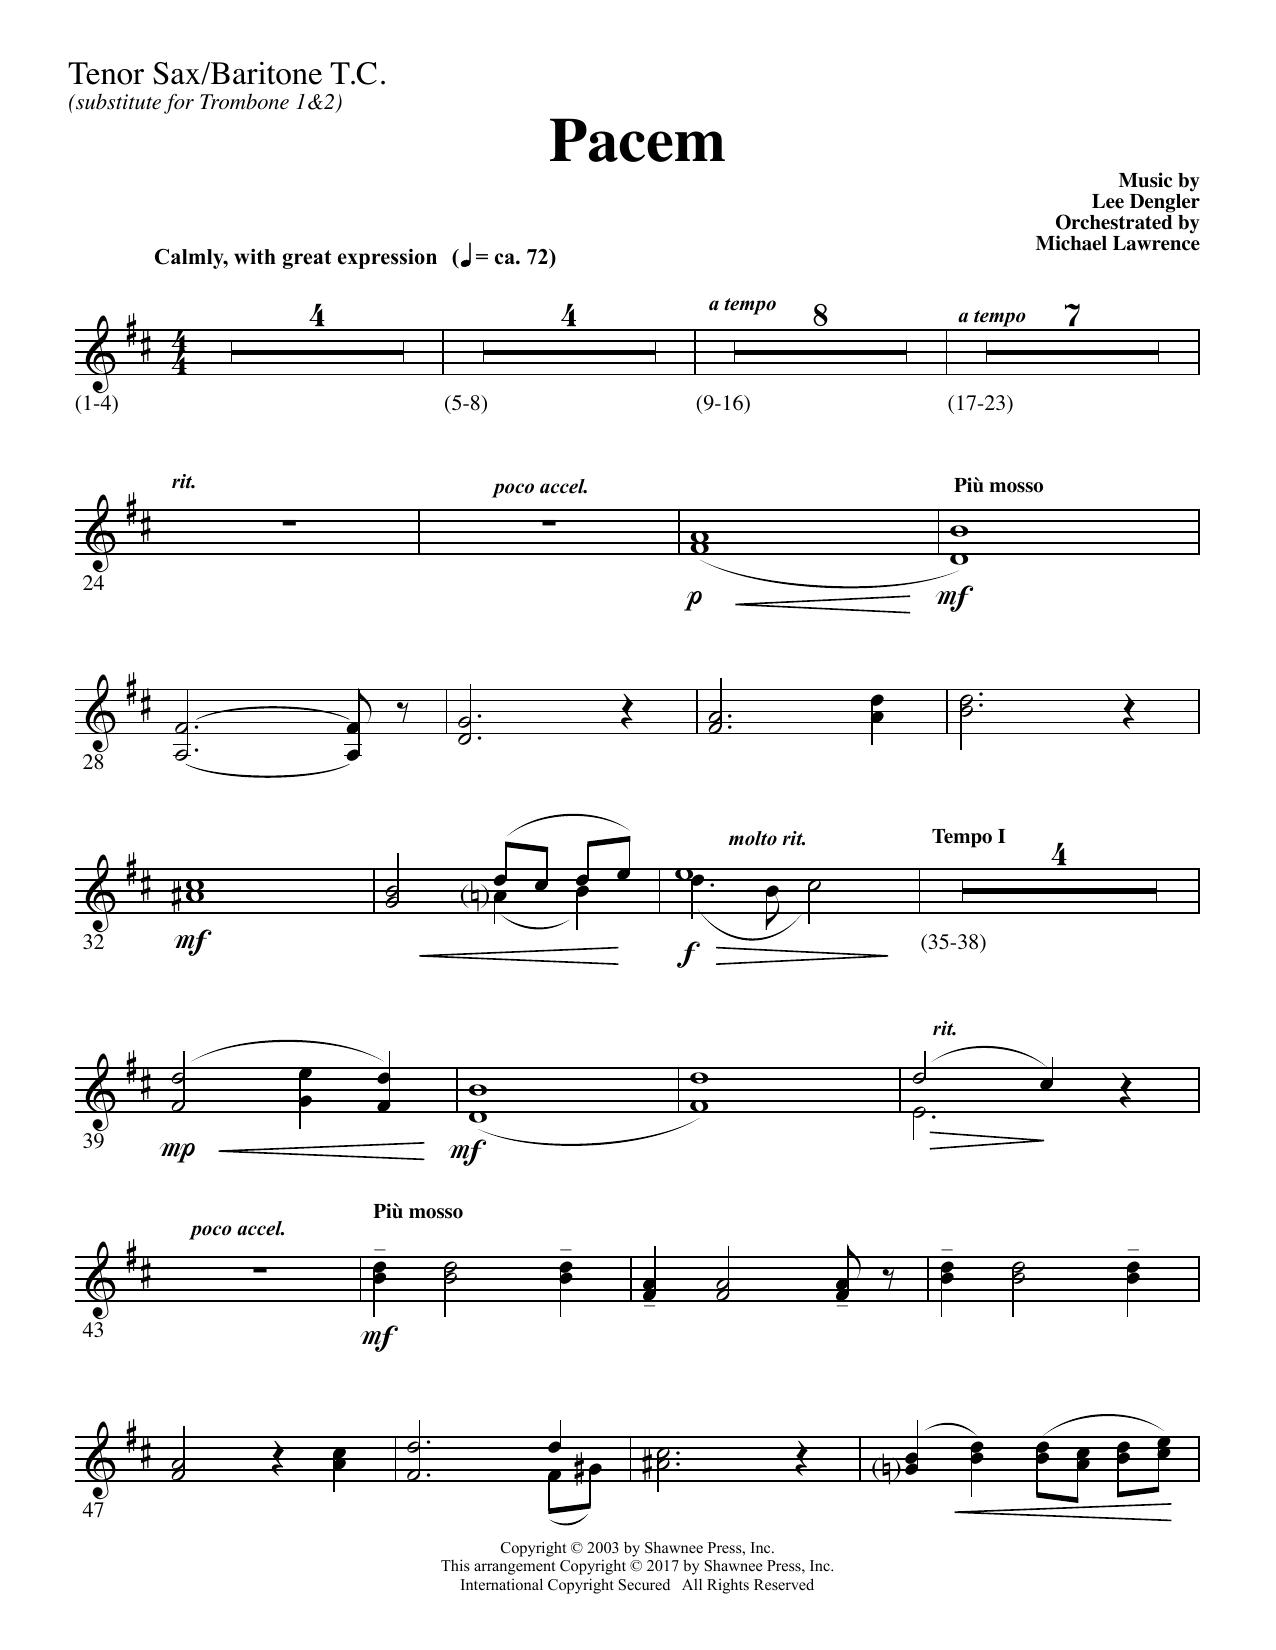 Pacem - Tenor Sax/BariTC (sub Tbn 1-2) (Choir Instrumental Pak)